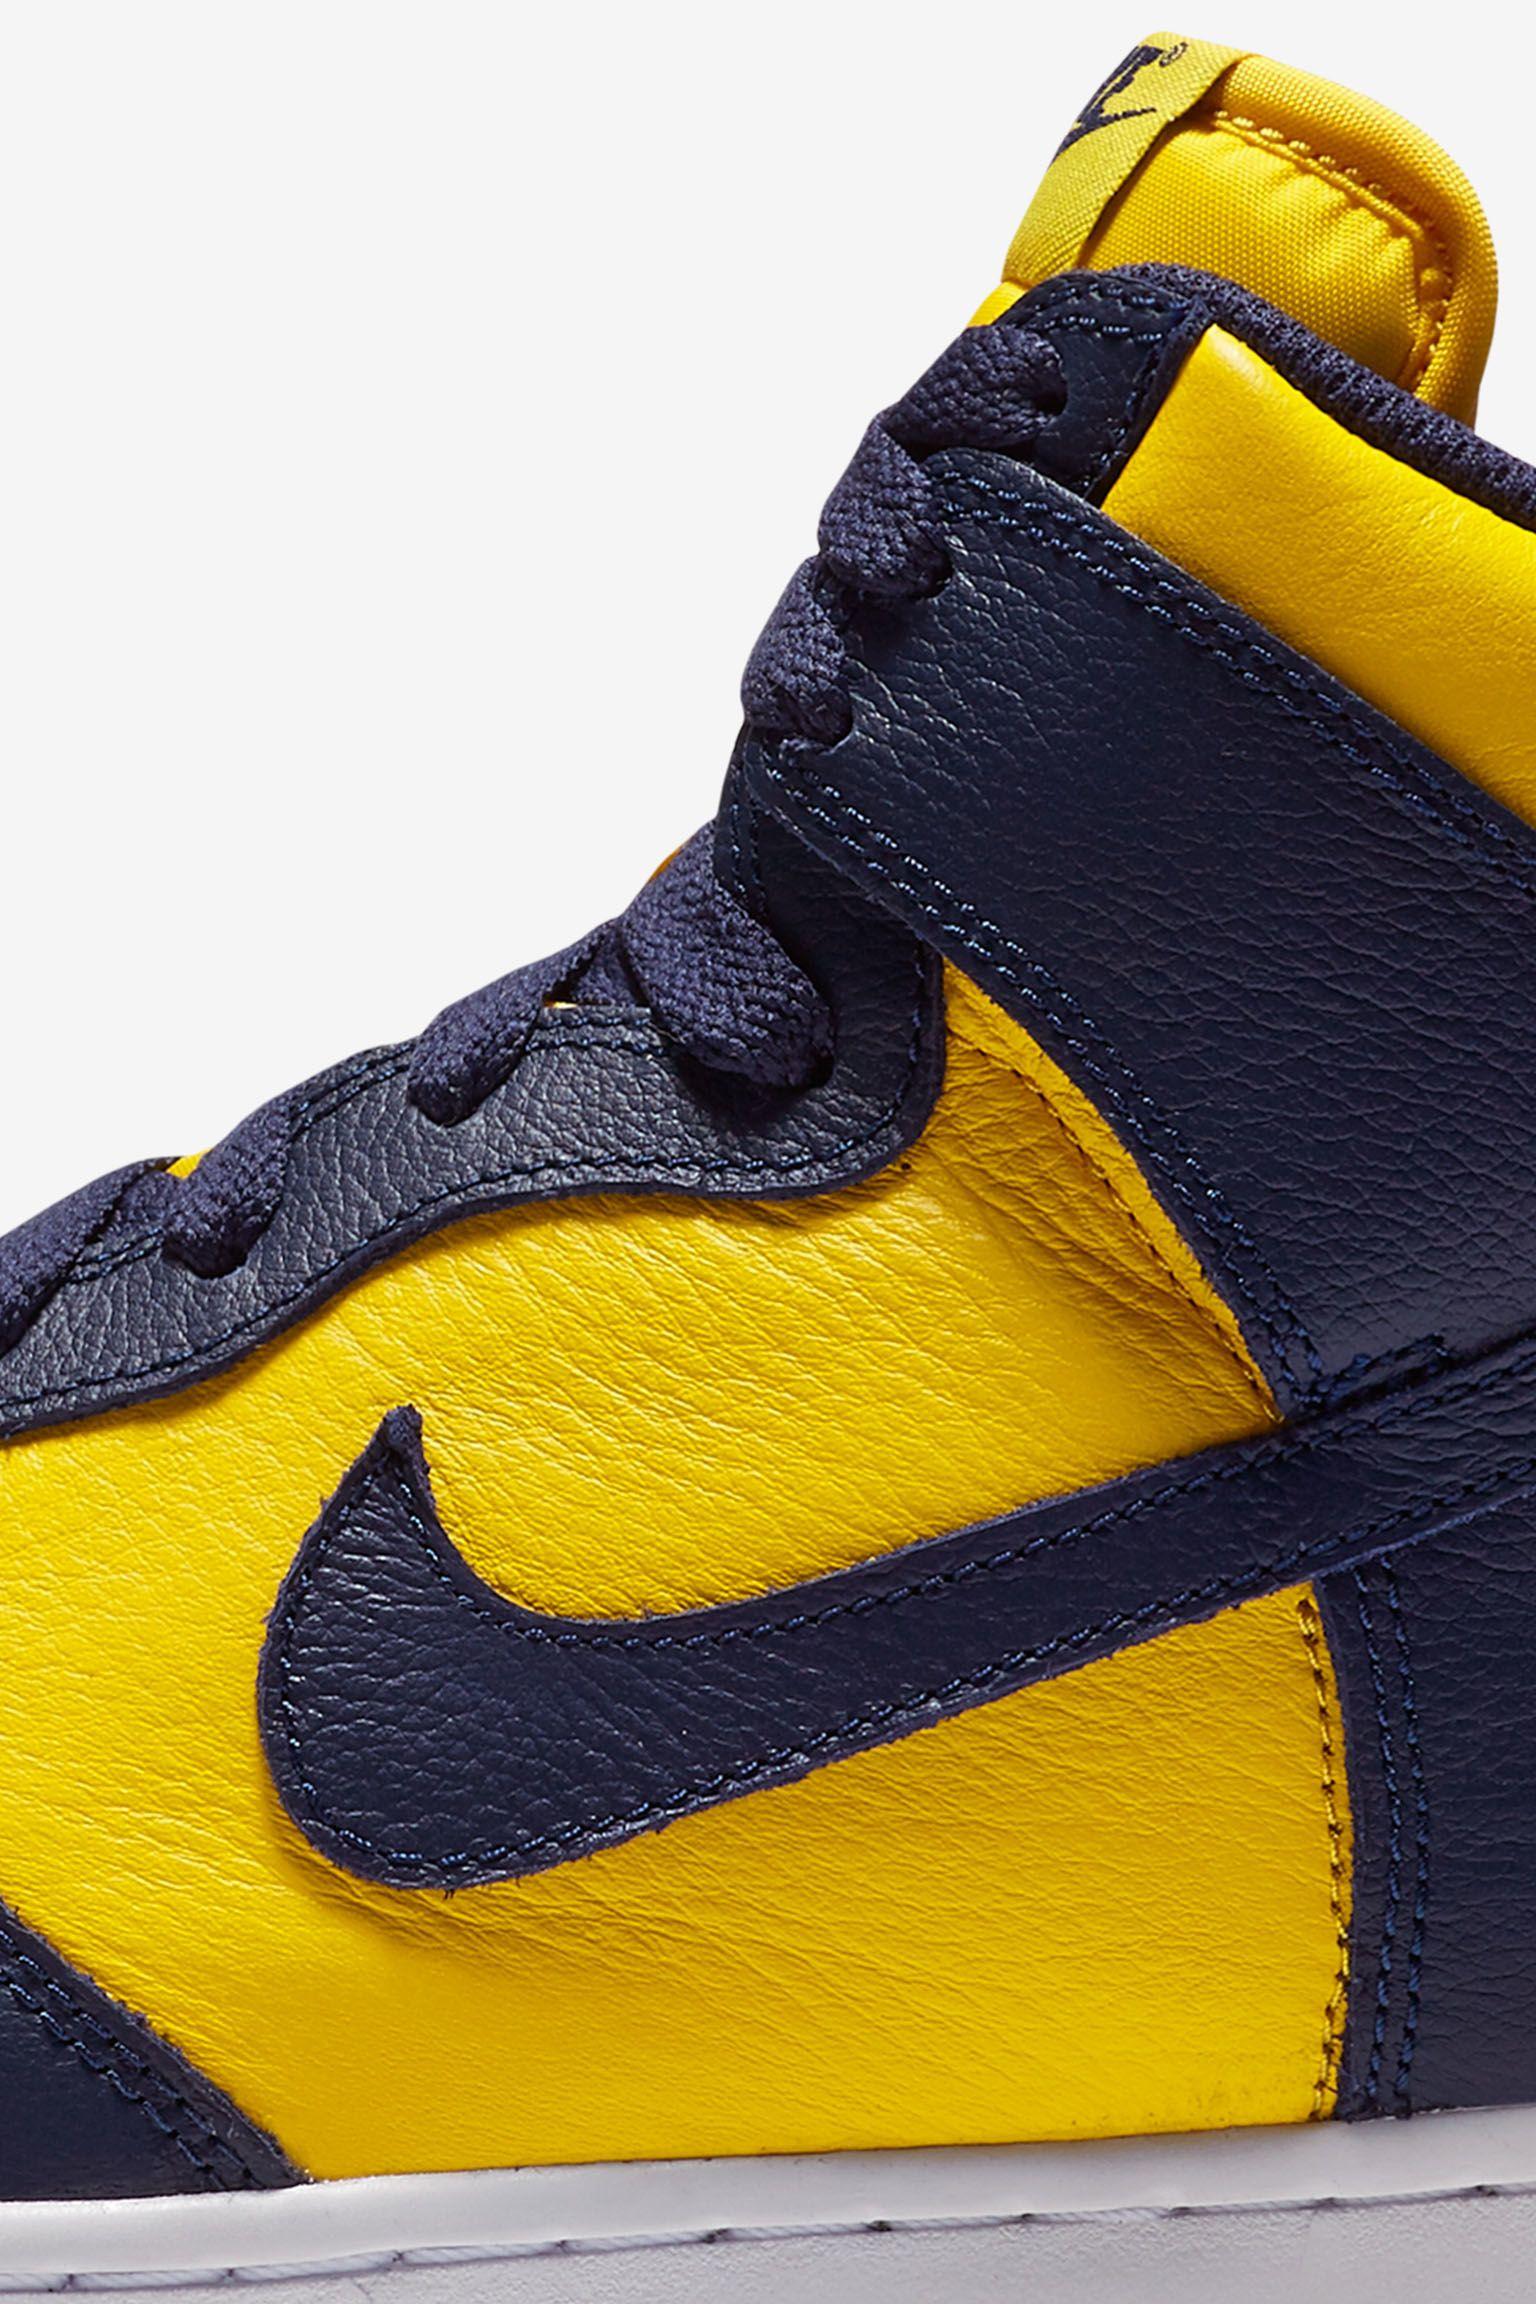 Nike College Colors Program: Nike Dunk High 'Michigan'